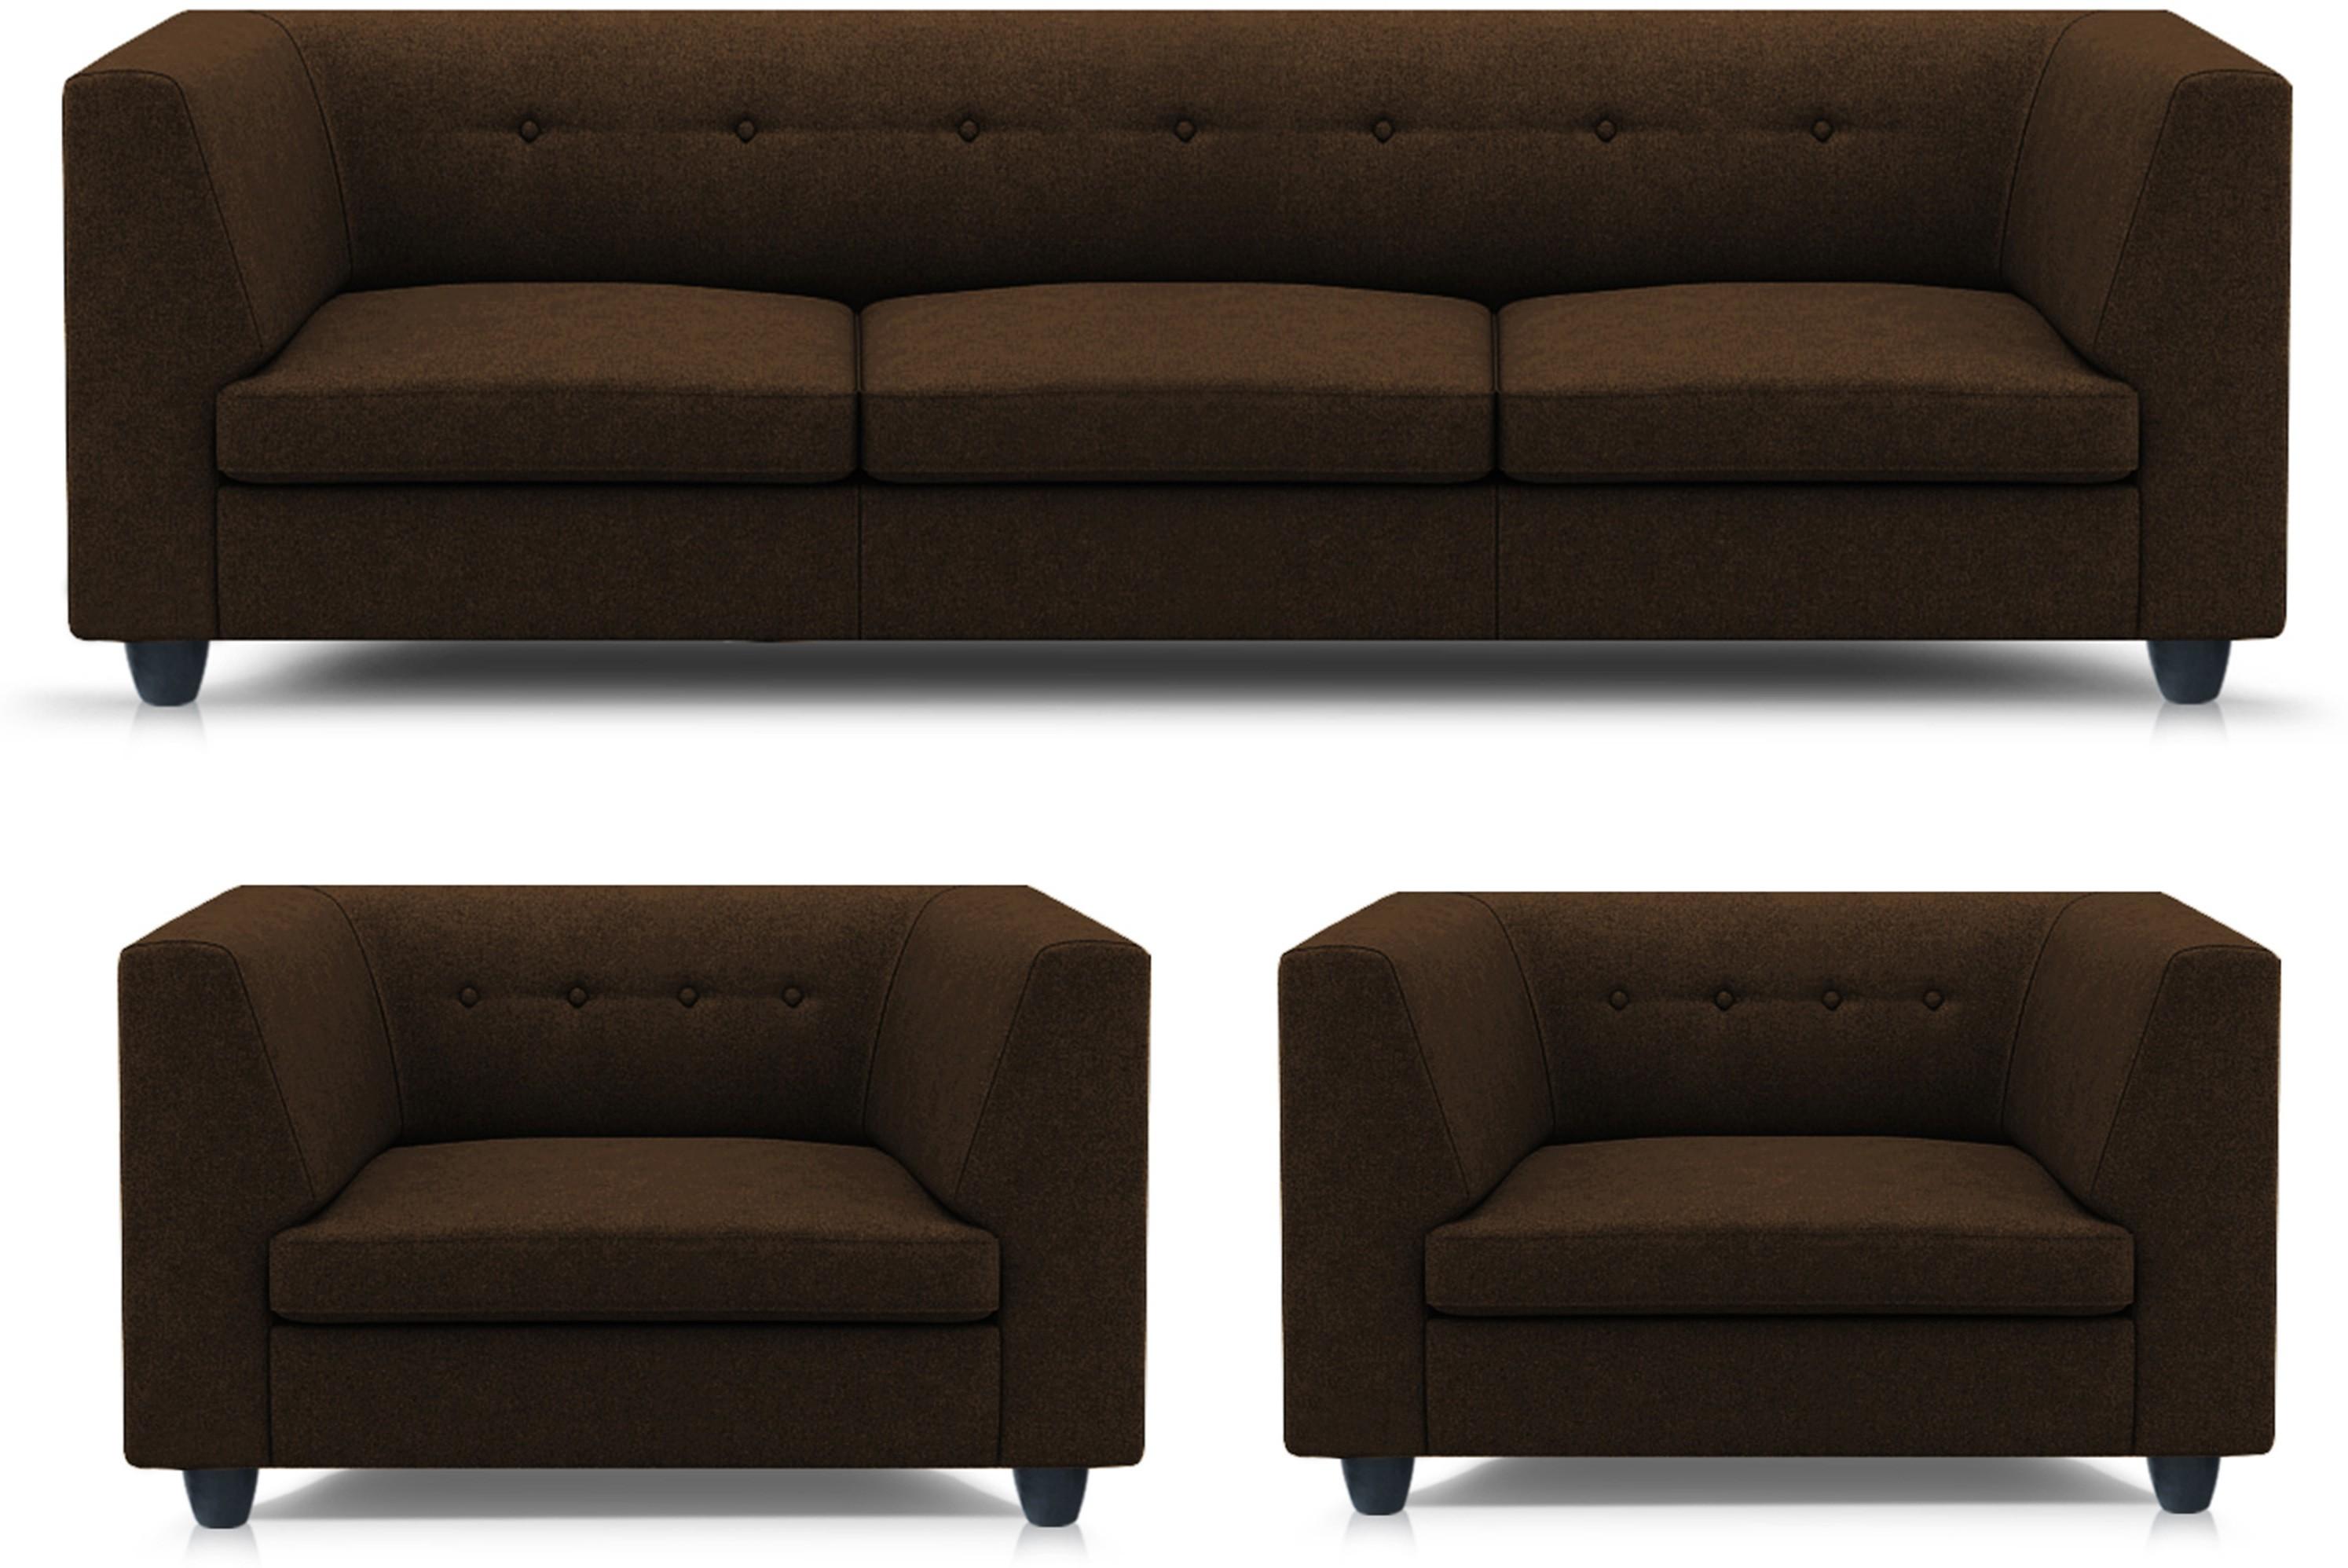 Adorn homez furniture price list